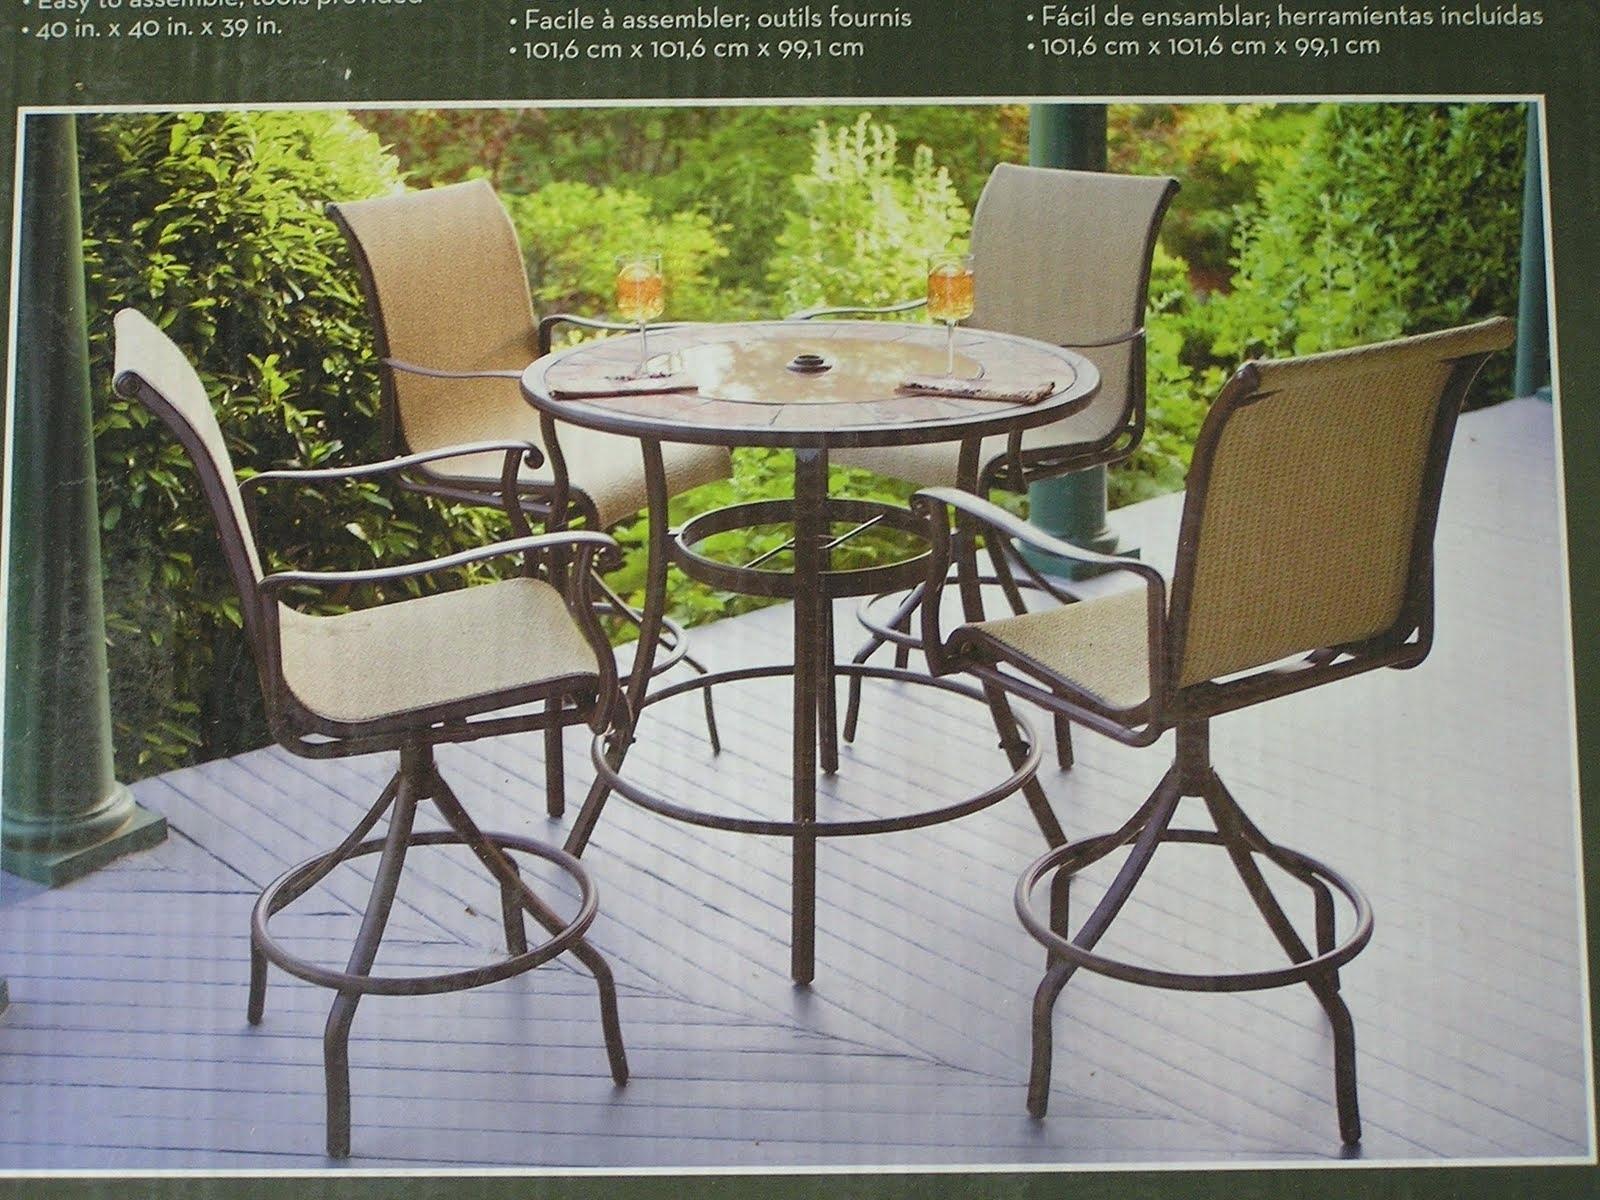 Pleasing Outdoor Patio Furniture Under 200 Patio Ideas Home Interior And Landscaping Ologienasavecom